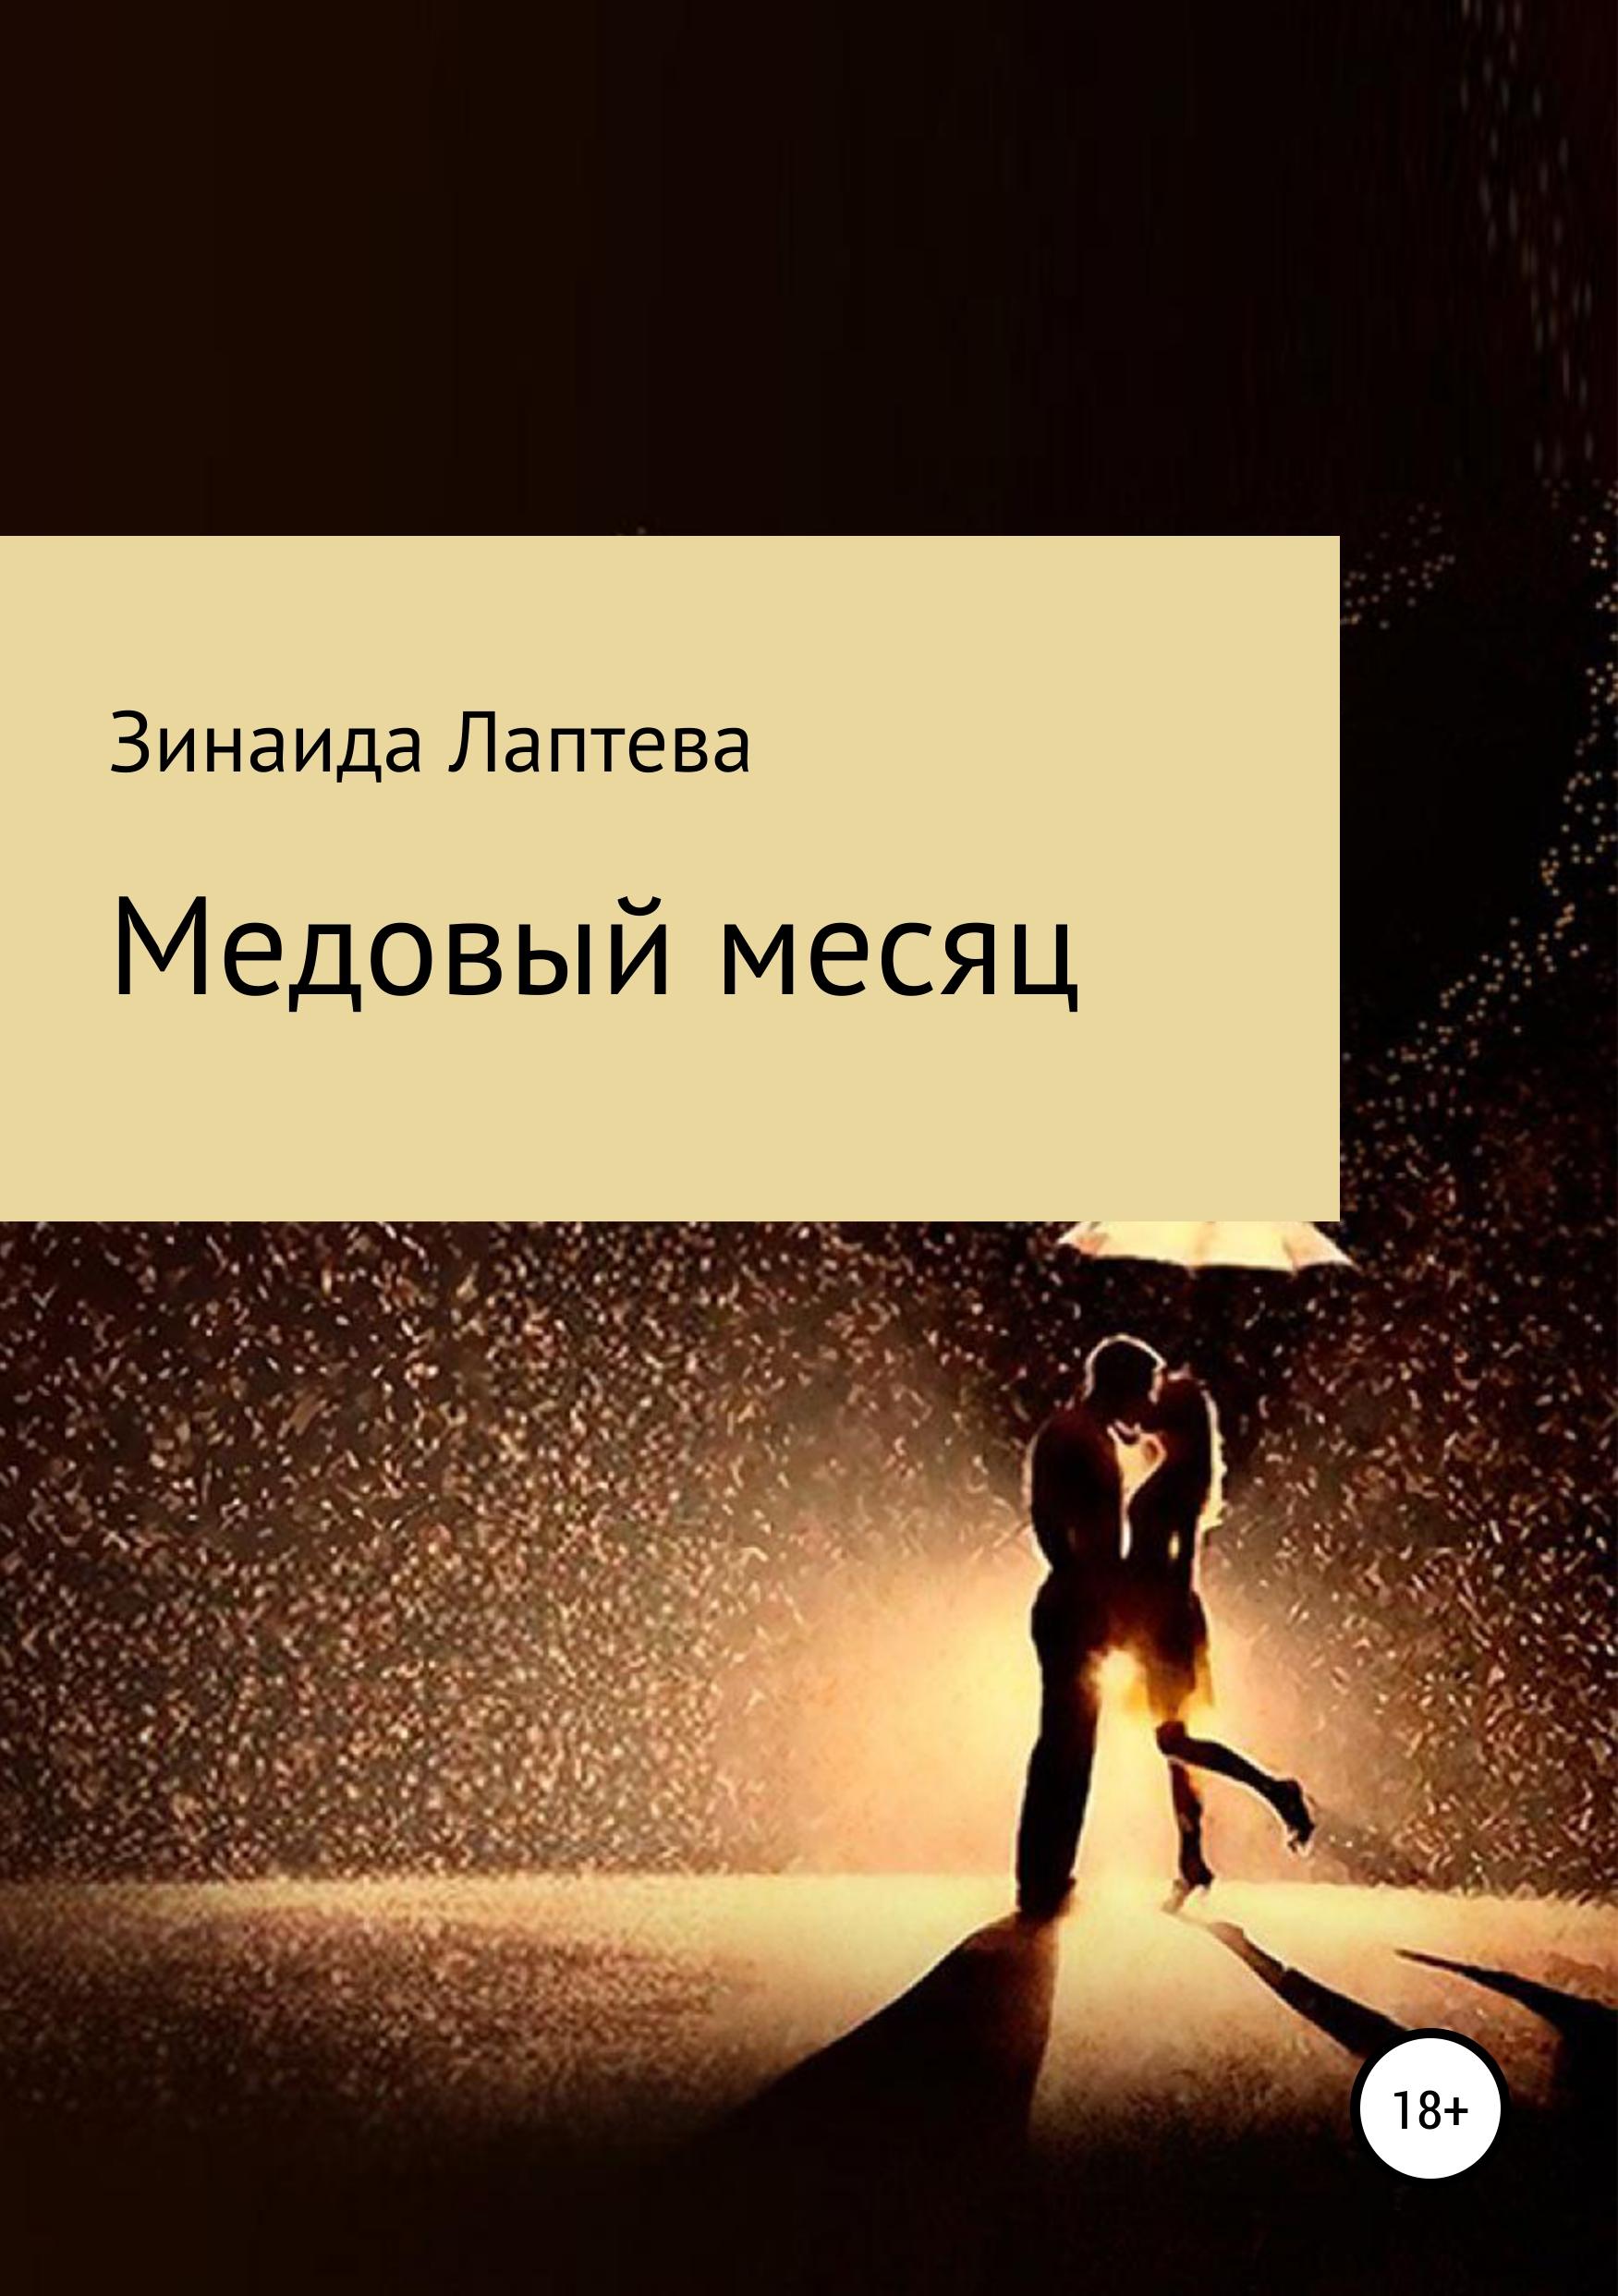 Электронная книга «Медовый месяц» – Зинаида Лаптева